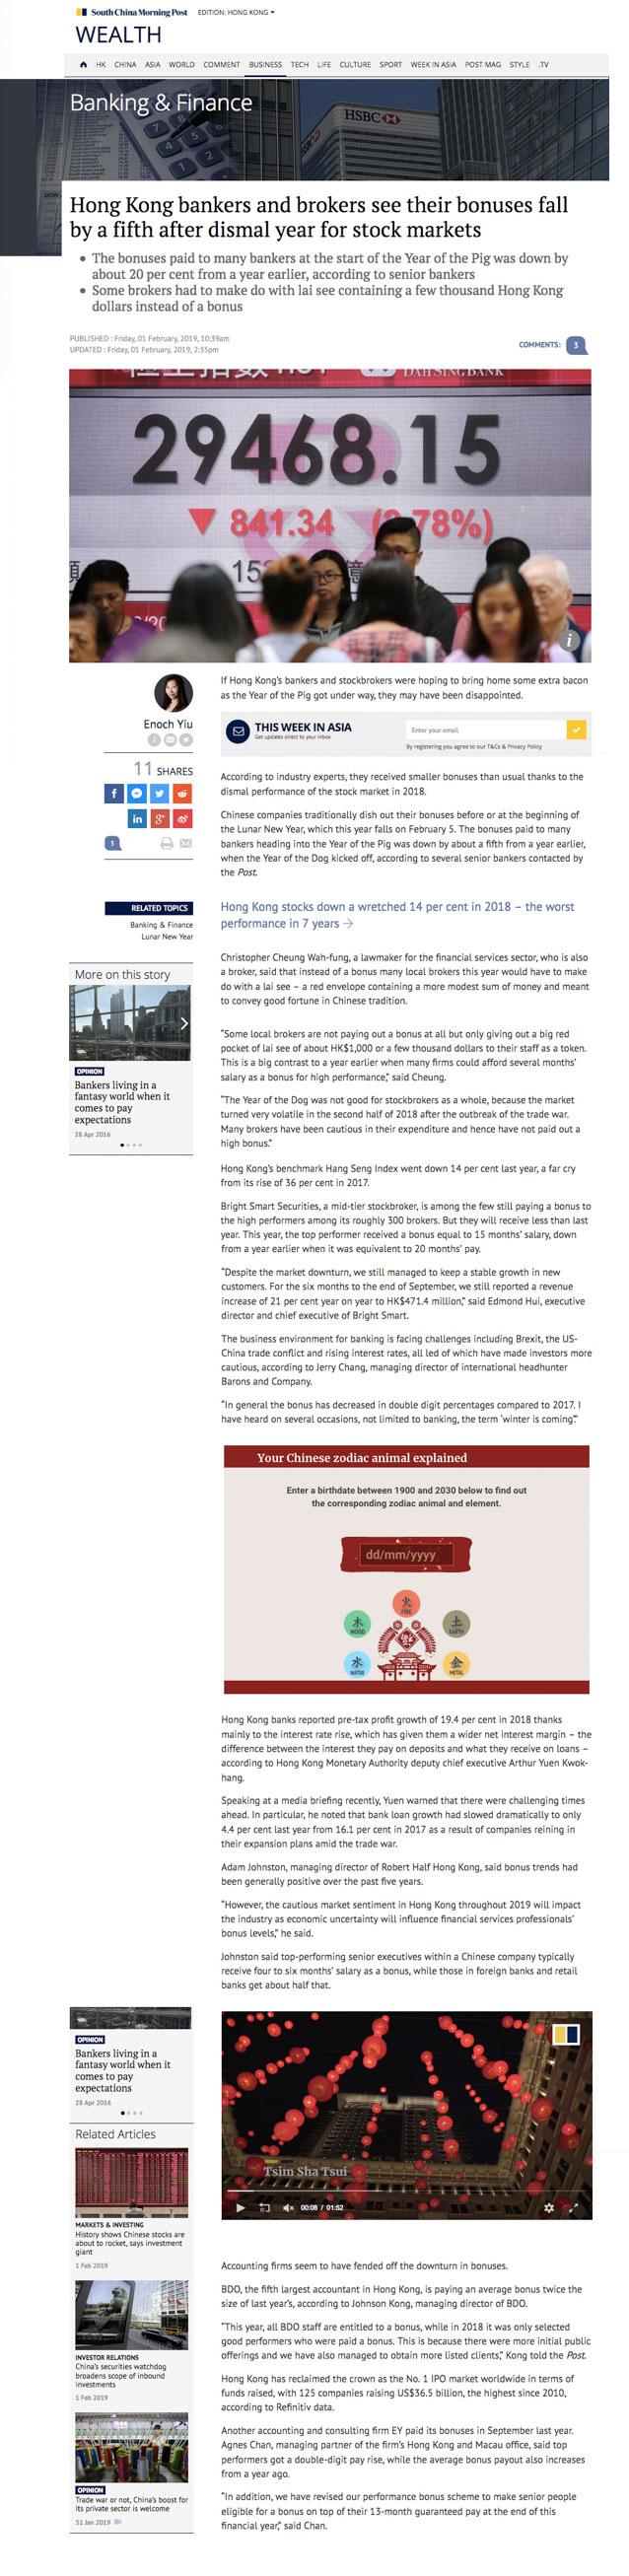 BARONS & COMPANY - International Executive Search